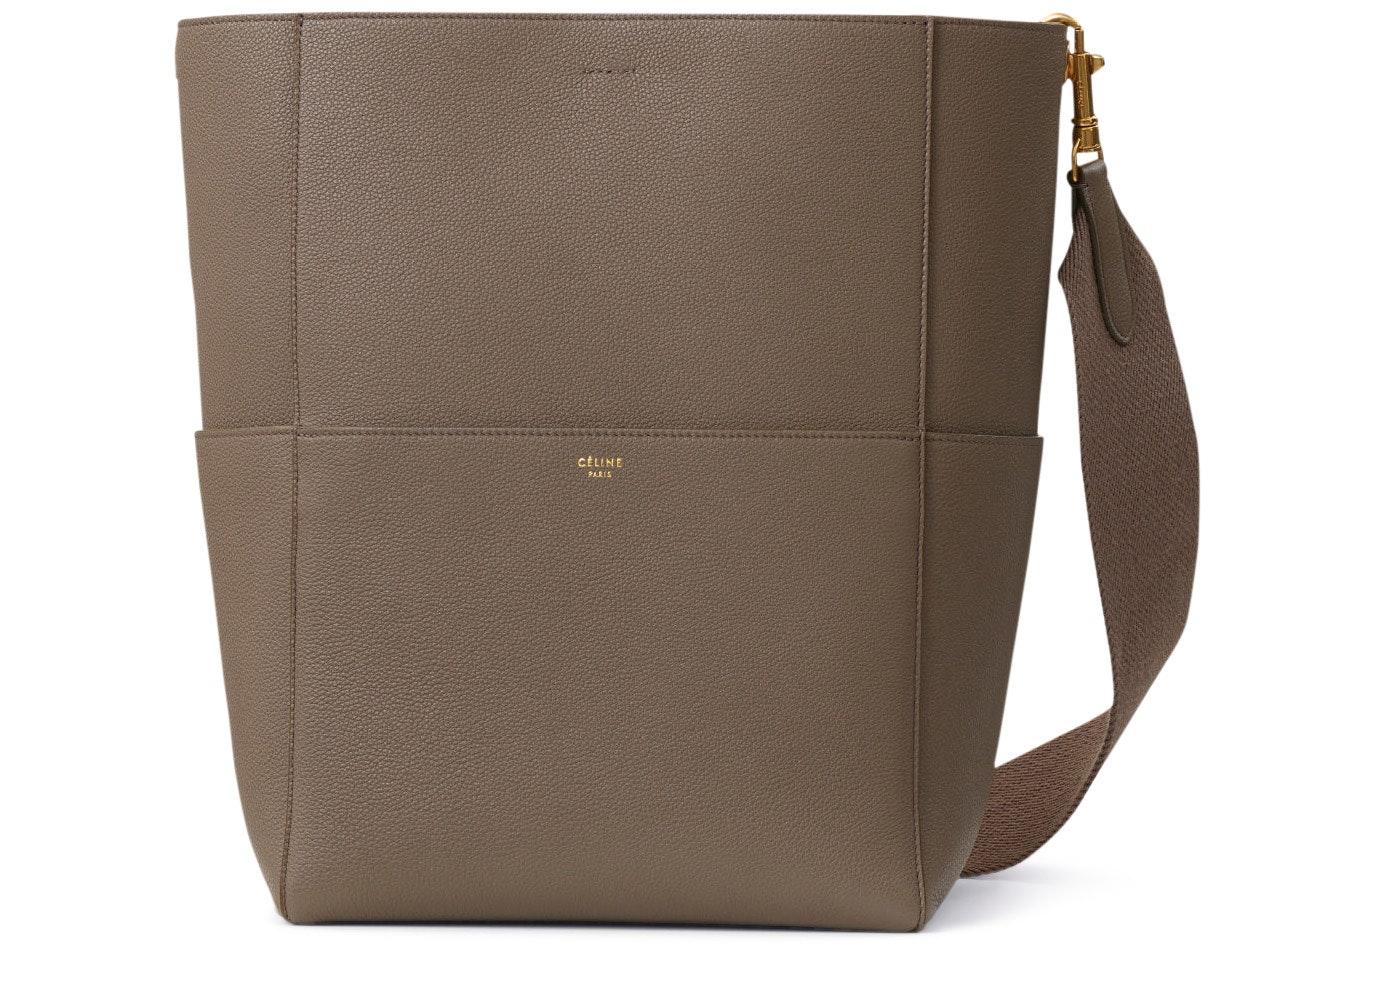 Celine Sangle Bucket Bag Cabas Taupe